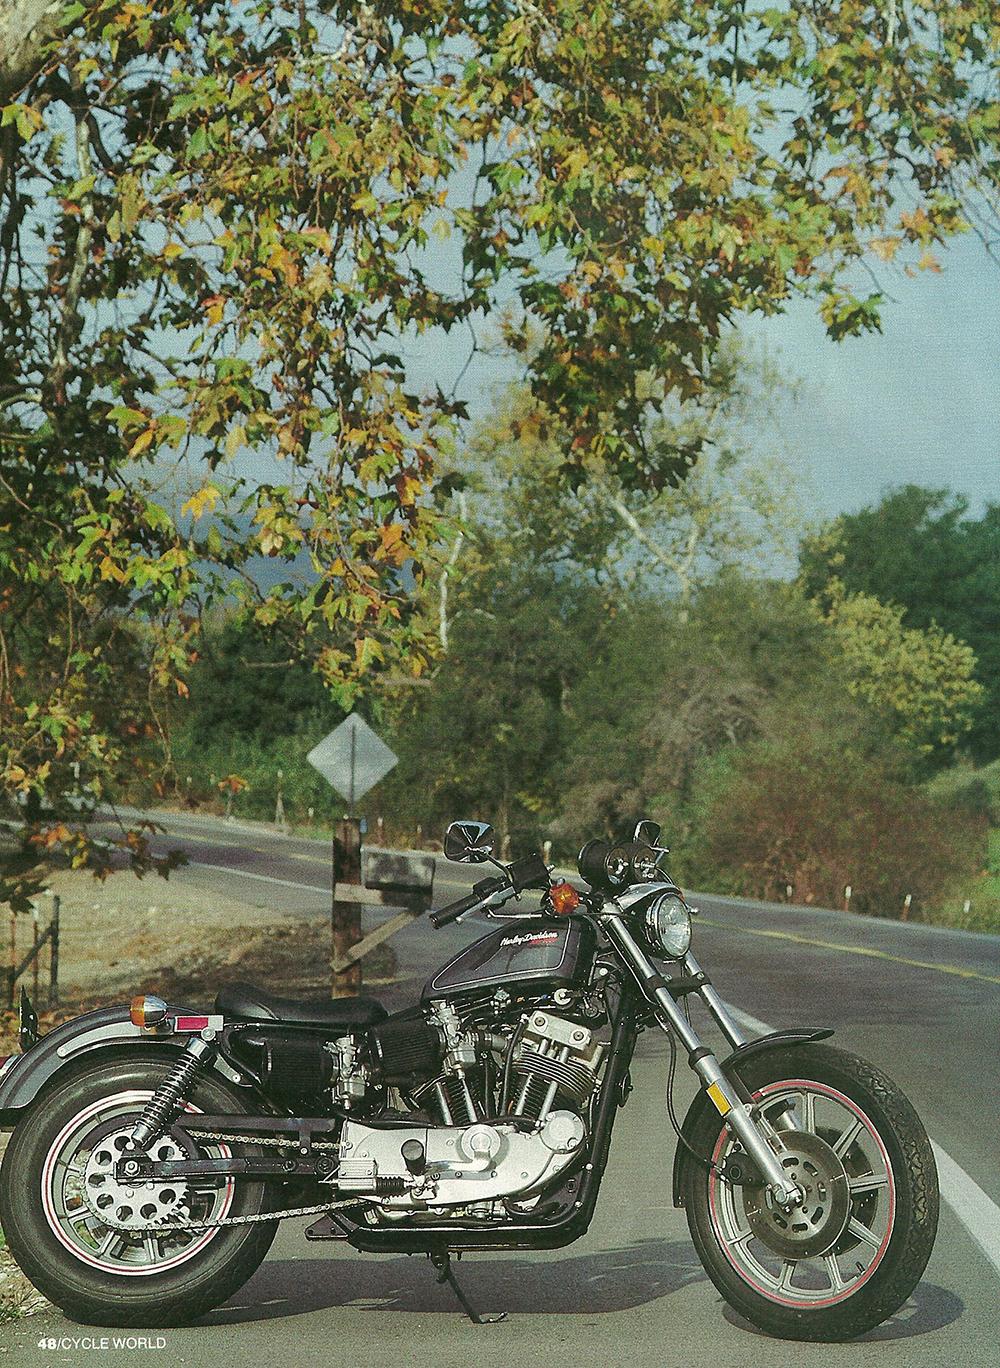 1983 Harley-Davidson XR1000 road test 03.jpg